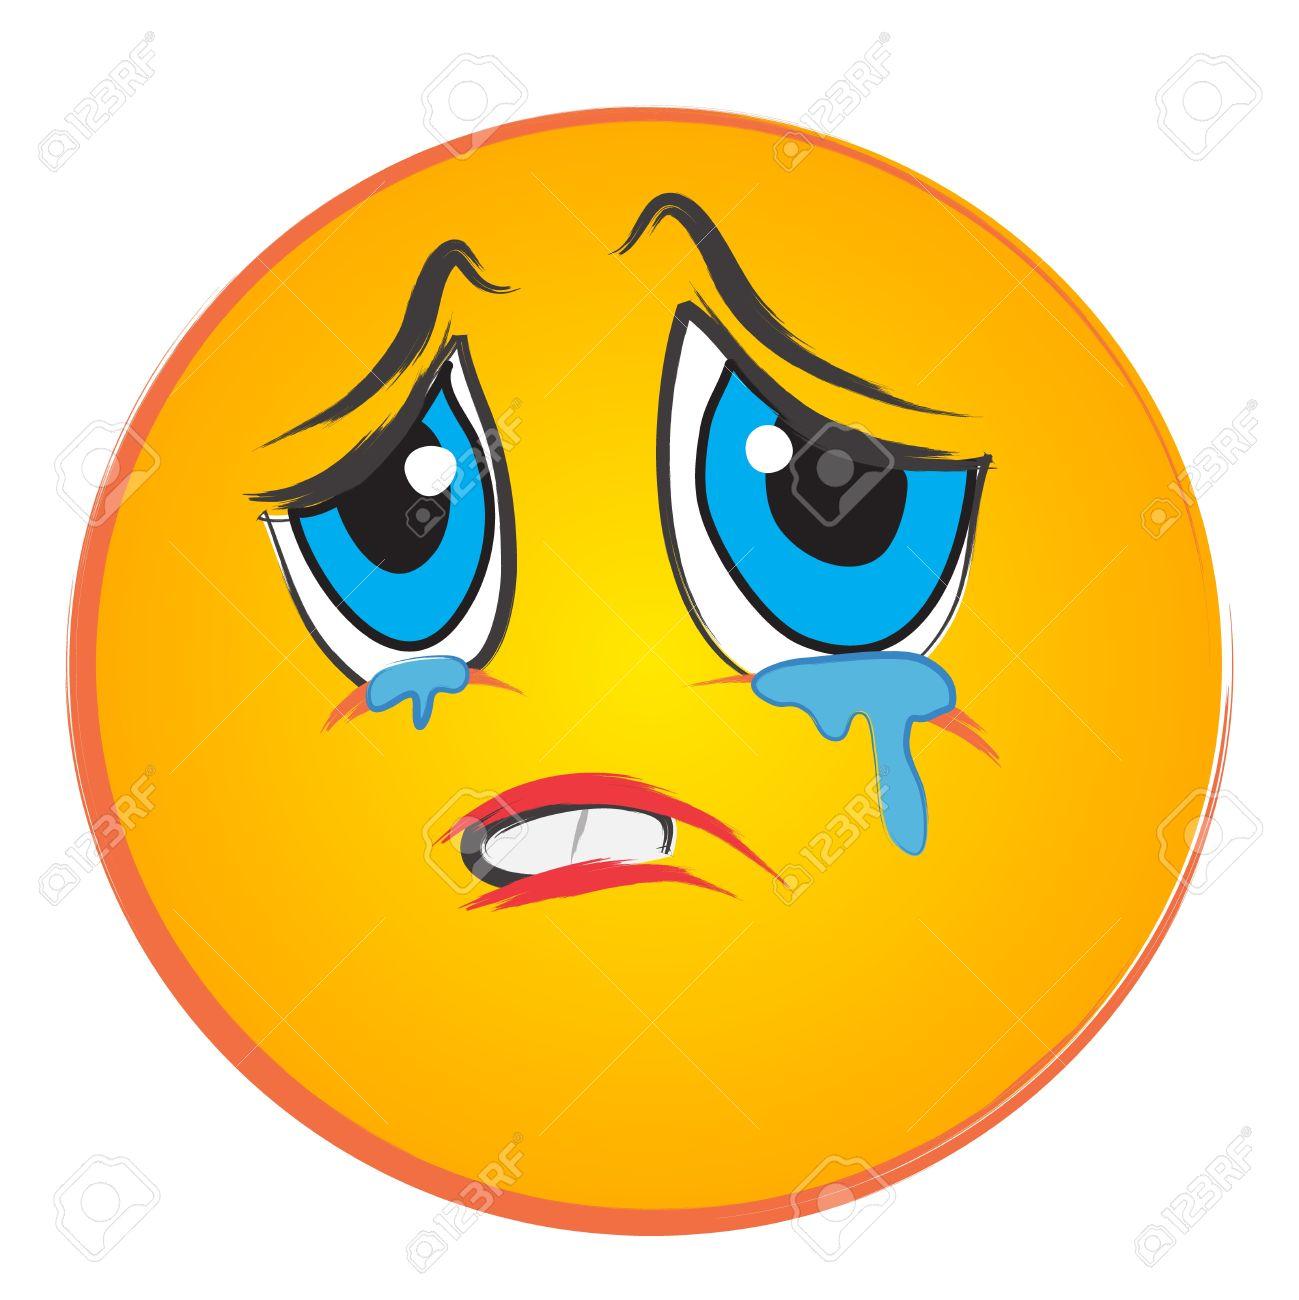 1299x1300 Clipart Face Sad